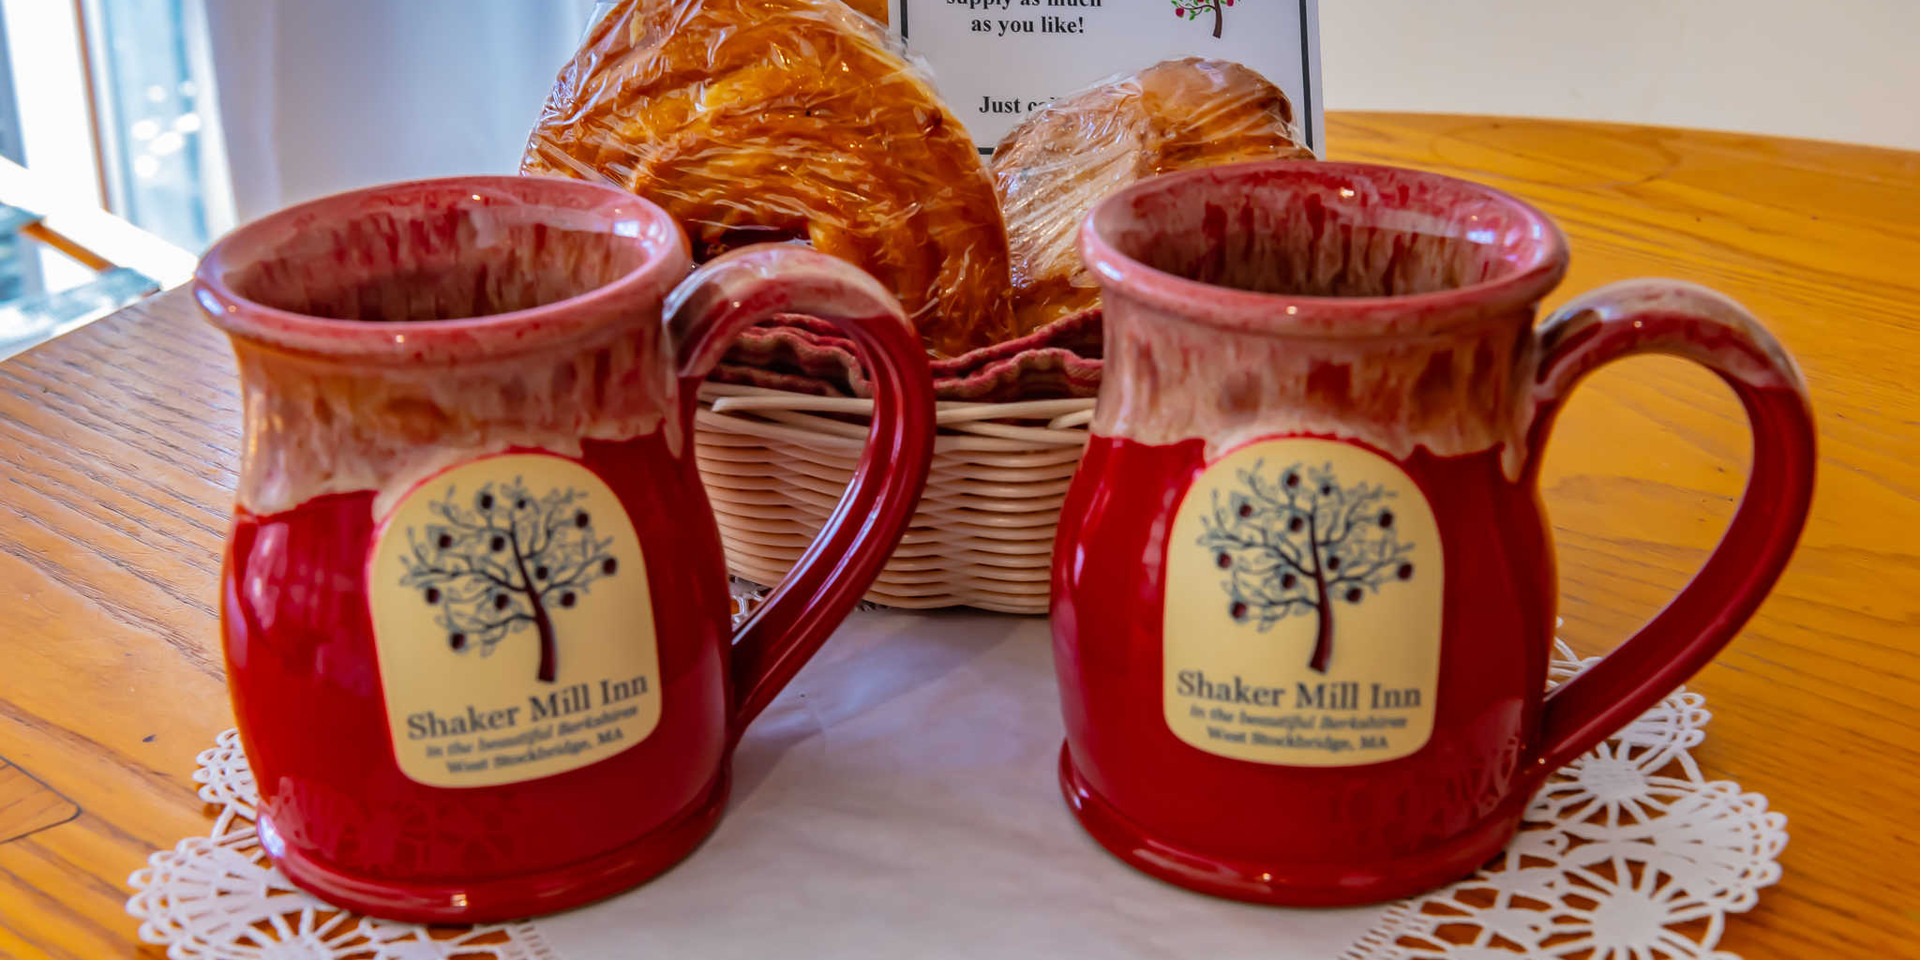 Shaker Mill Inn Mugs Available for Purchase